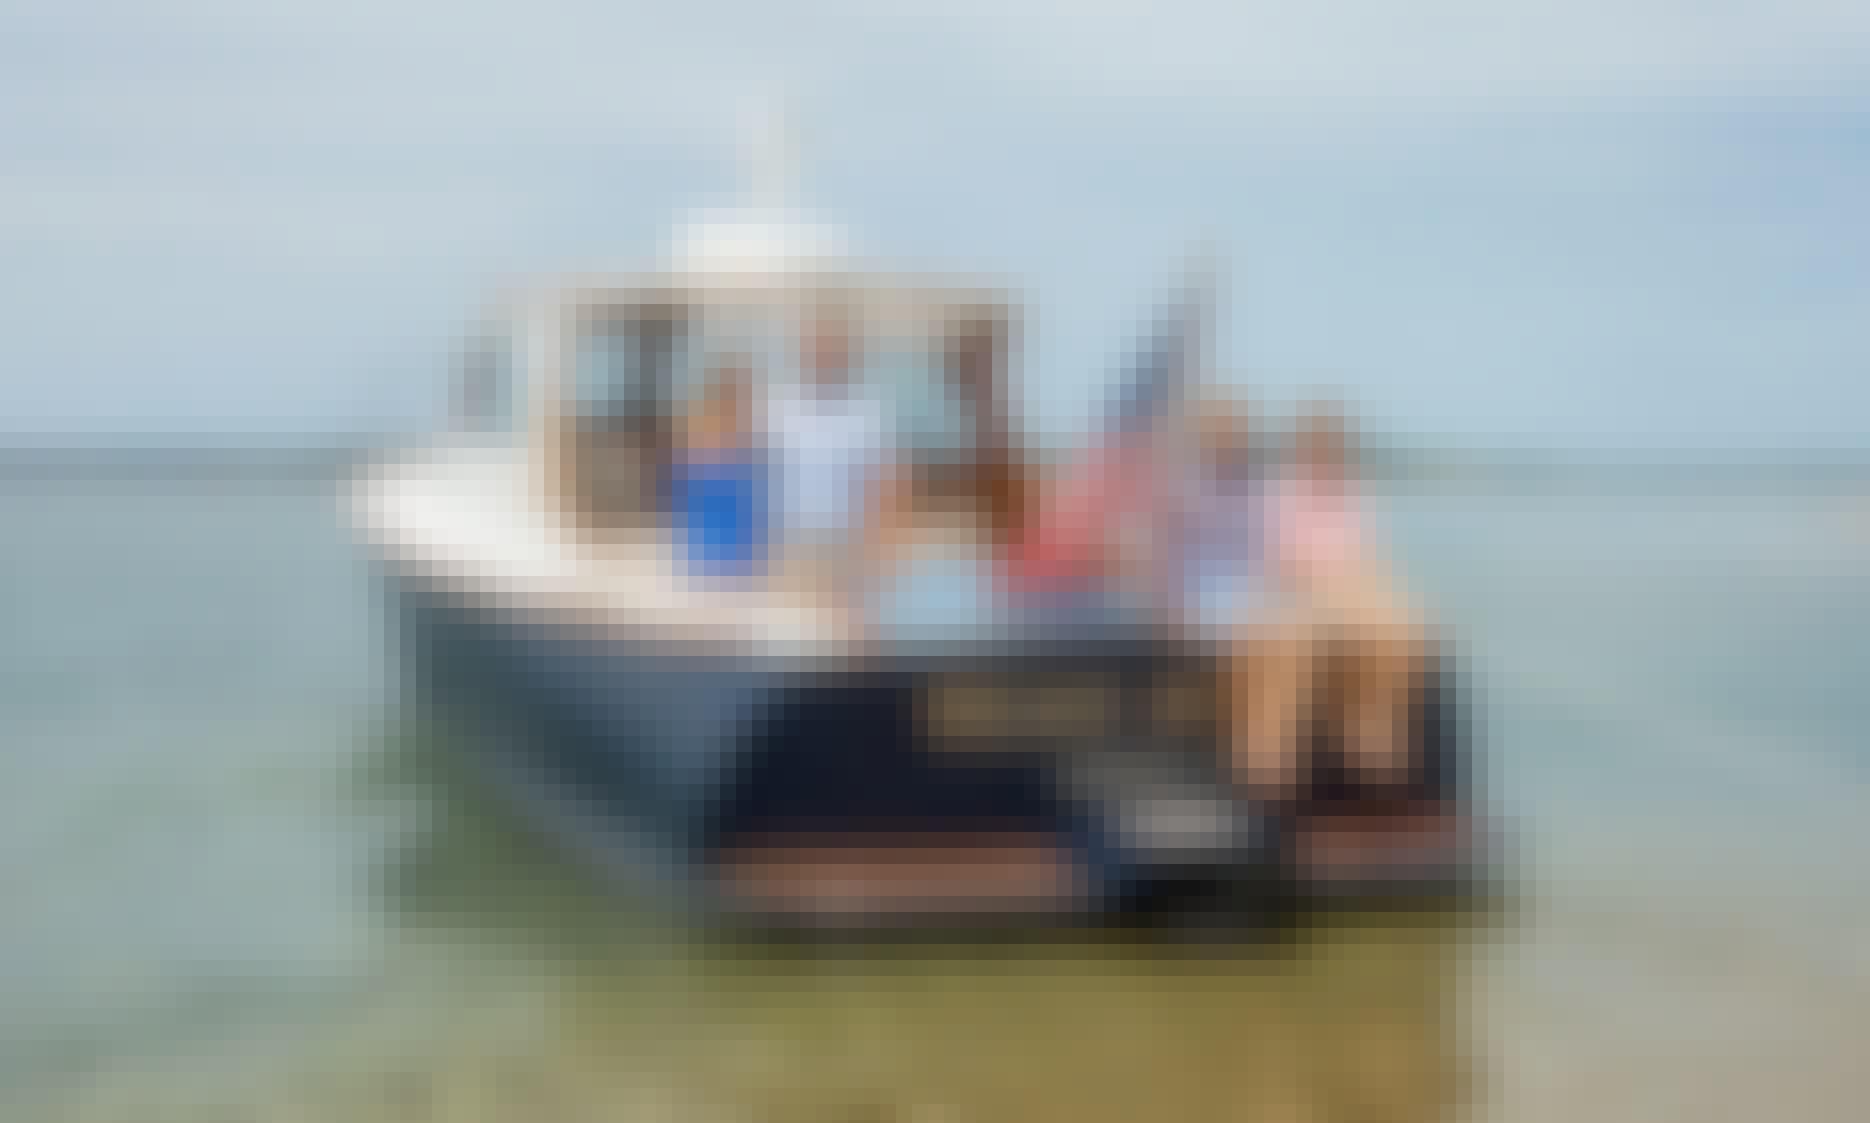 Yacht Charter Tour onboard 36' Hinckley Motor Yacht Around Newport, Rhode Islands!